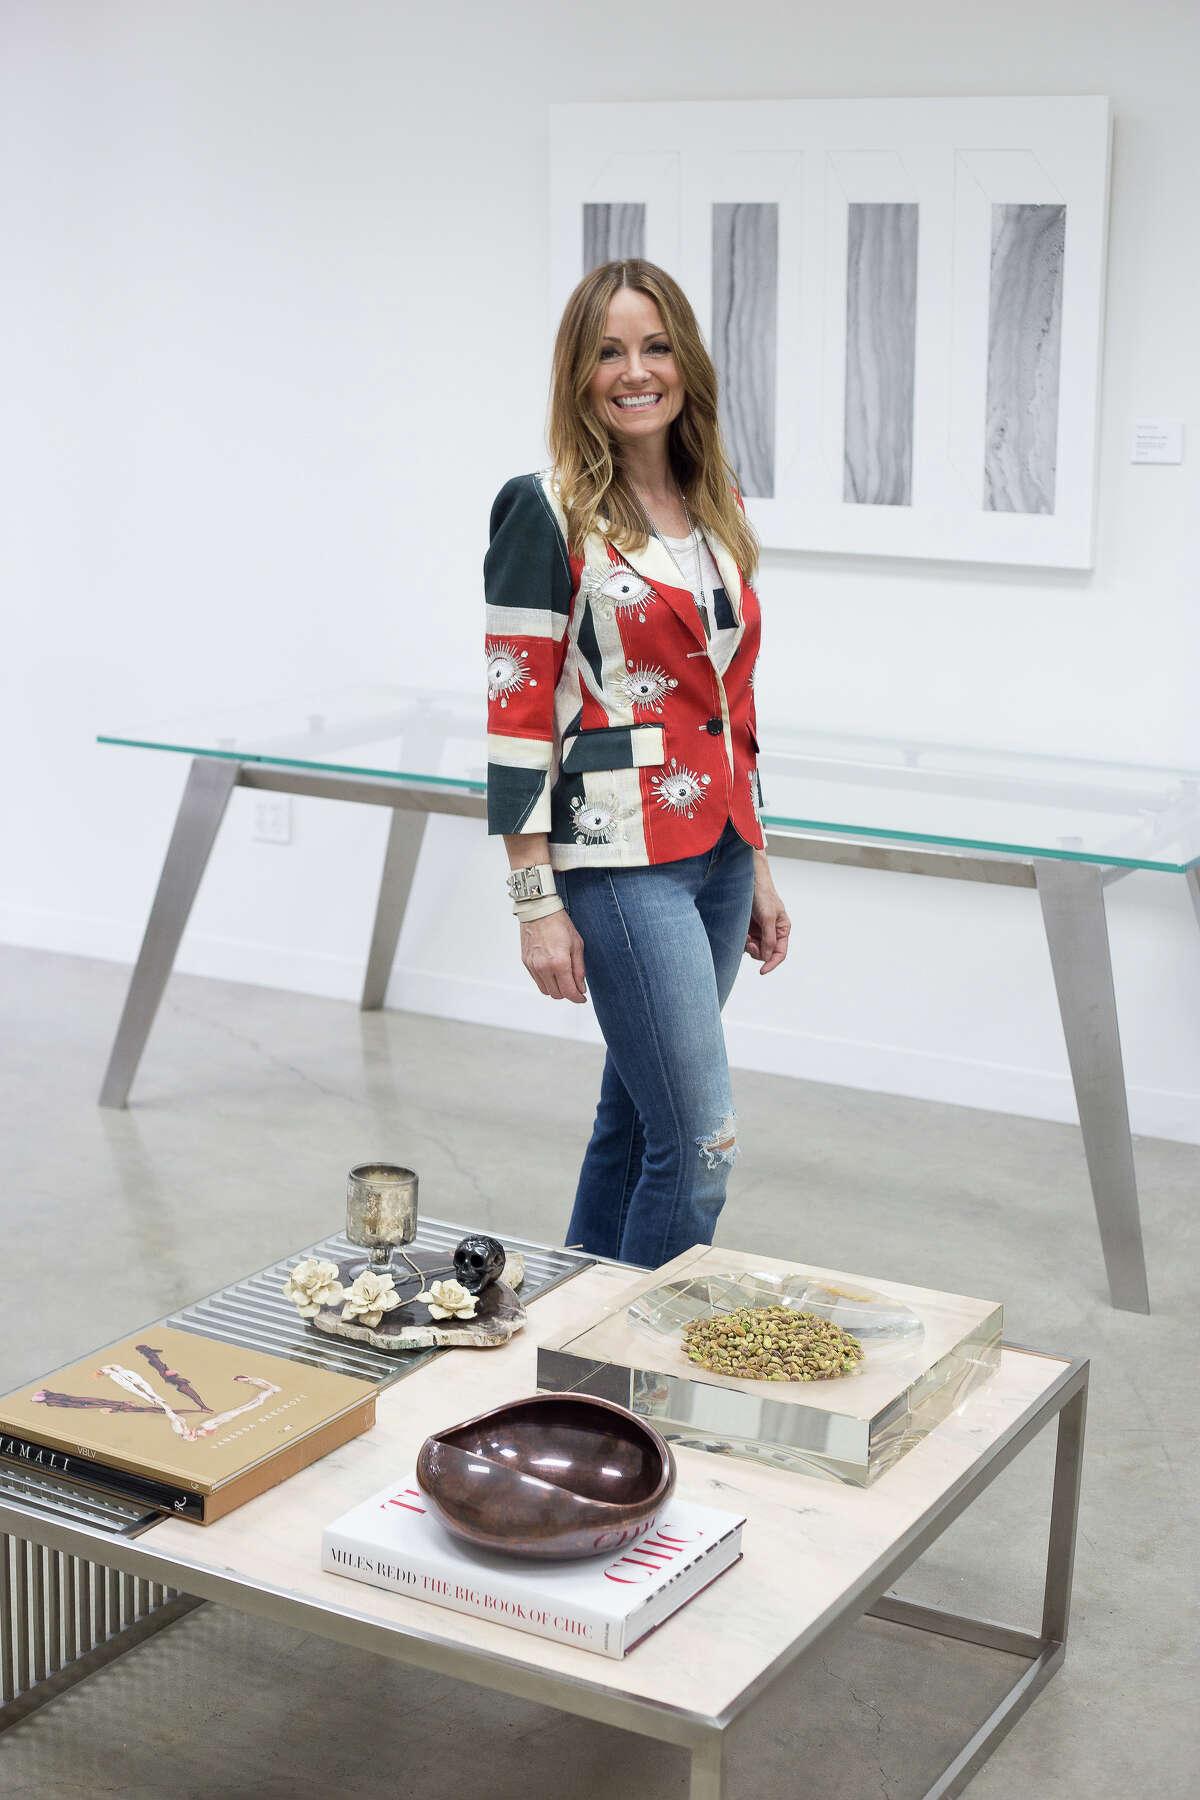 The Coffee Tablescape by interior designer Lucinda Loya at the Houston Design Center's DASH BASH helps kick off the DASH Market.